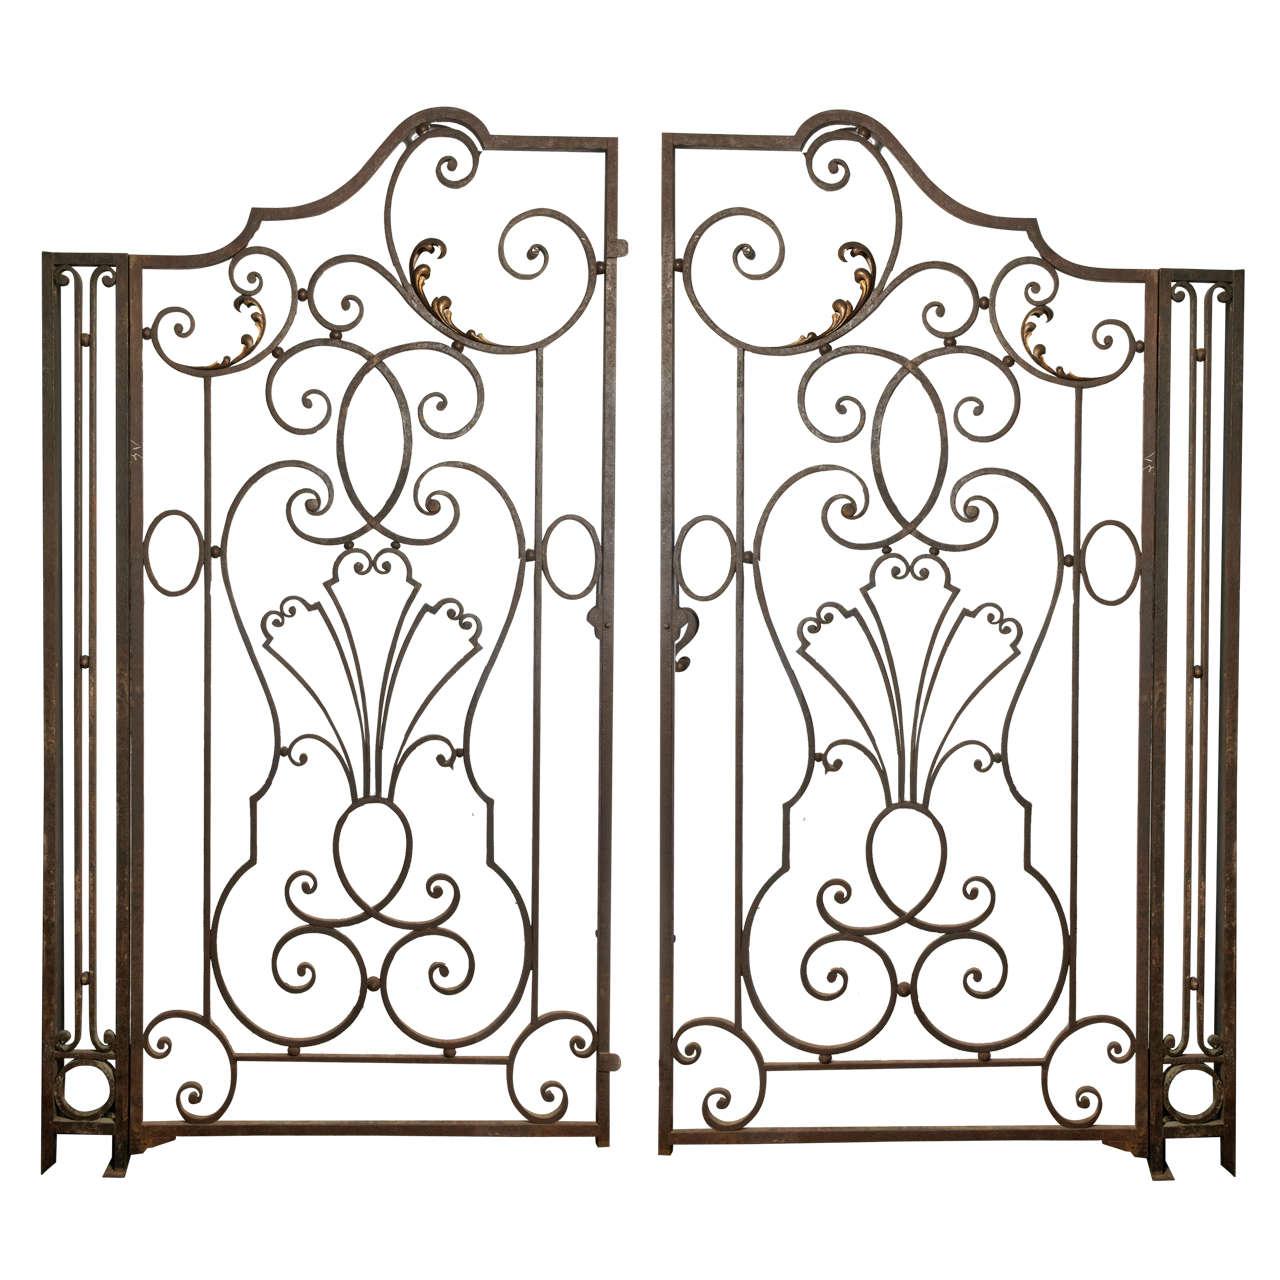 Wrought iron garden gate - Wrought Iron Garden Gate